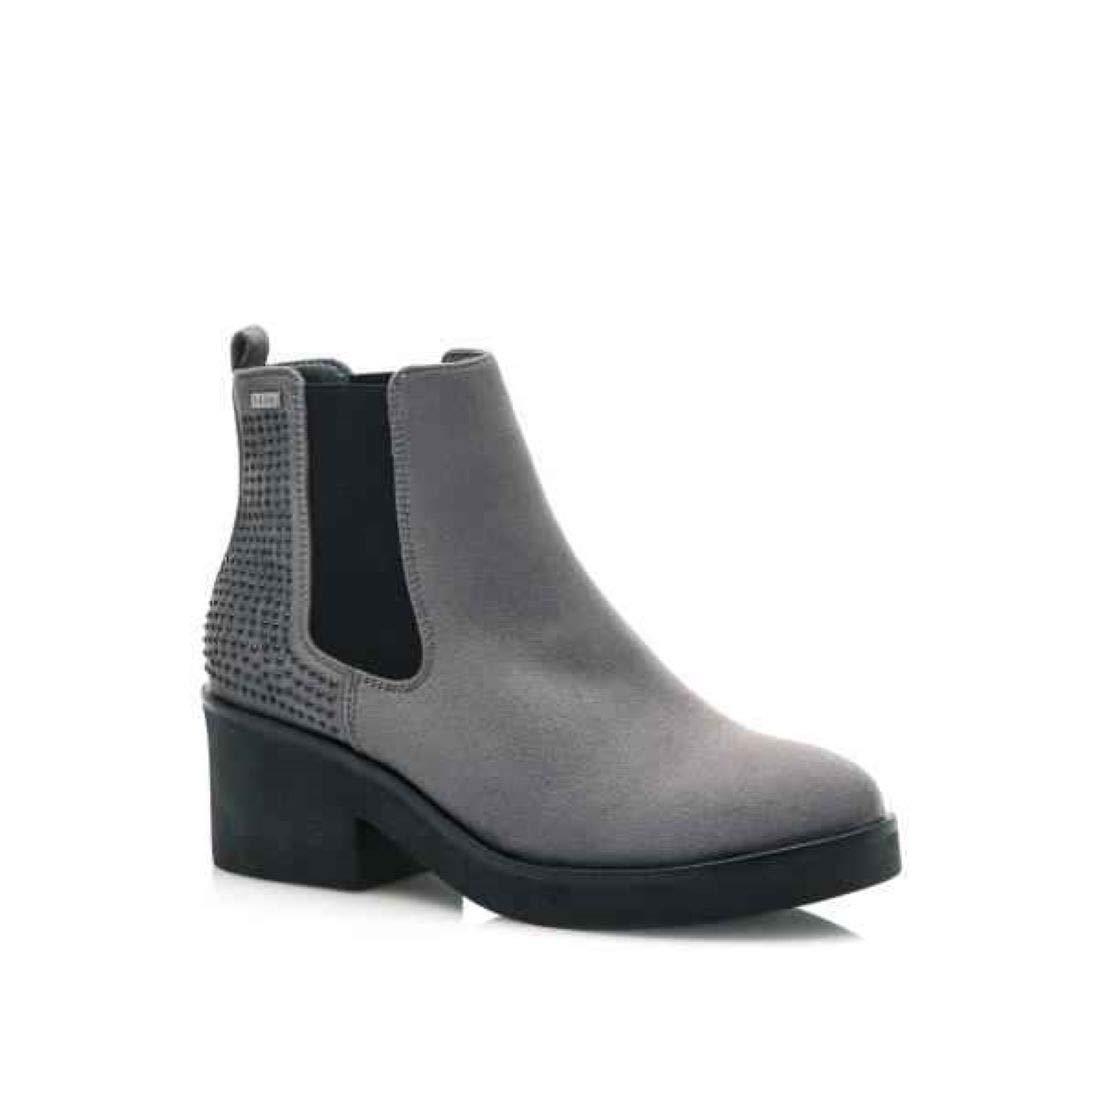 Mustang Damen Stiefel Stiefel Damen & Stiefeletten Grau grau f83e03